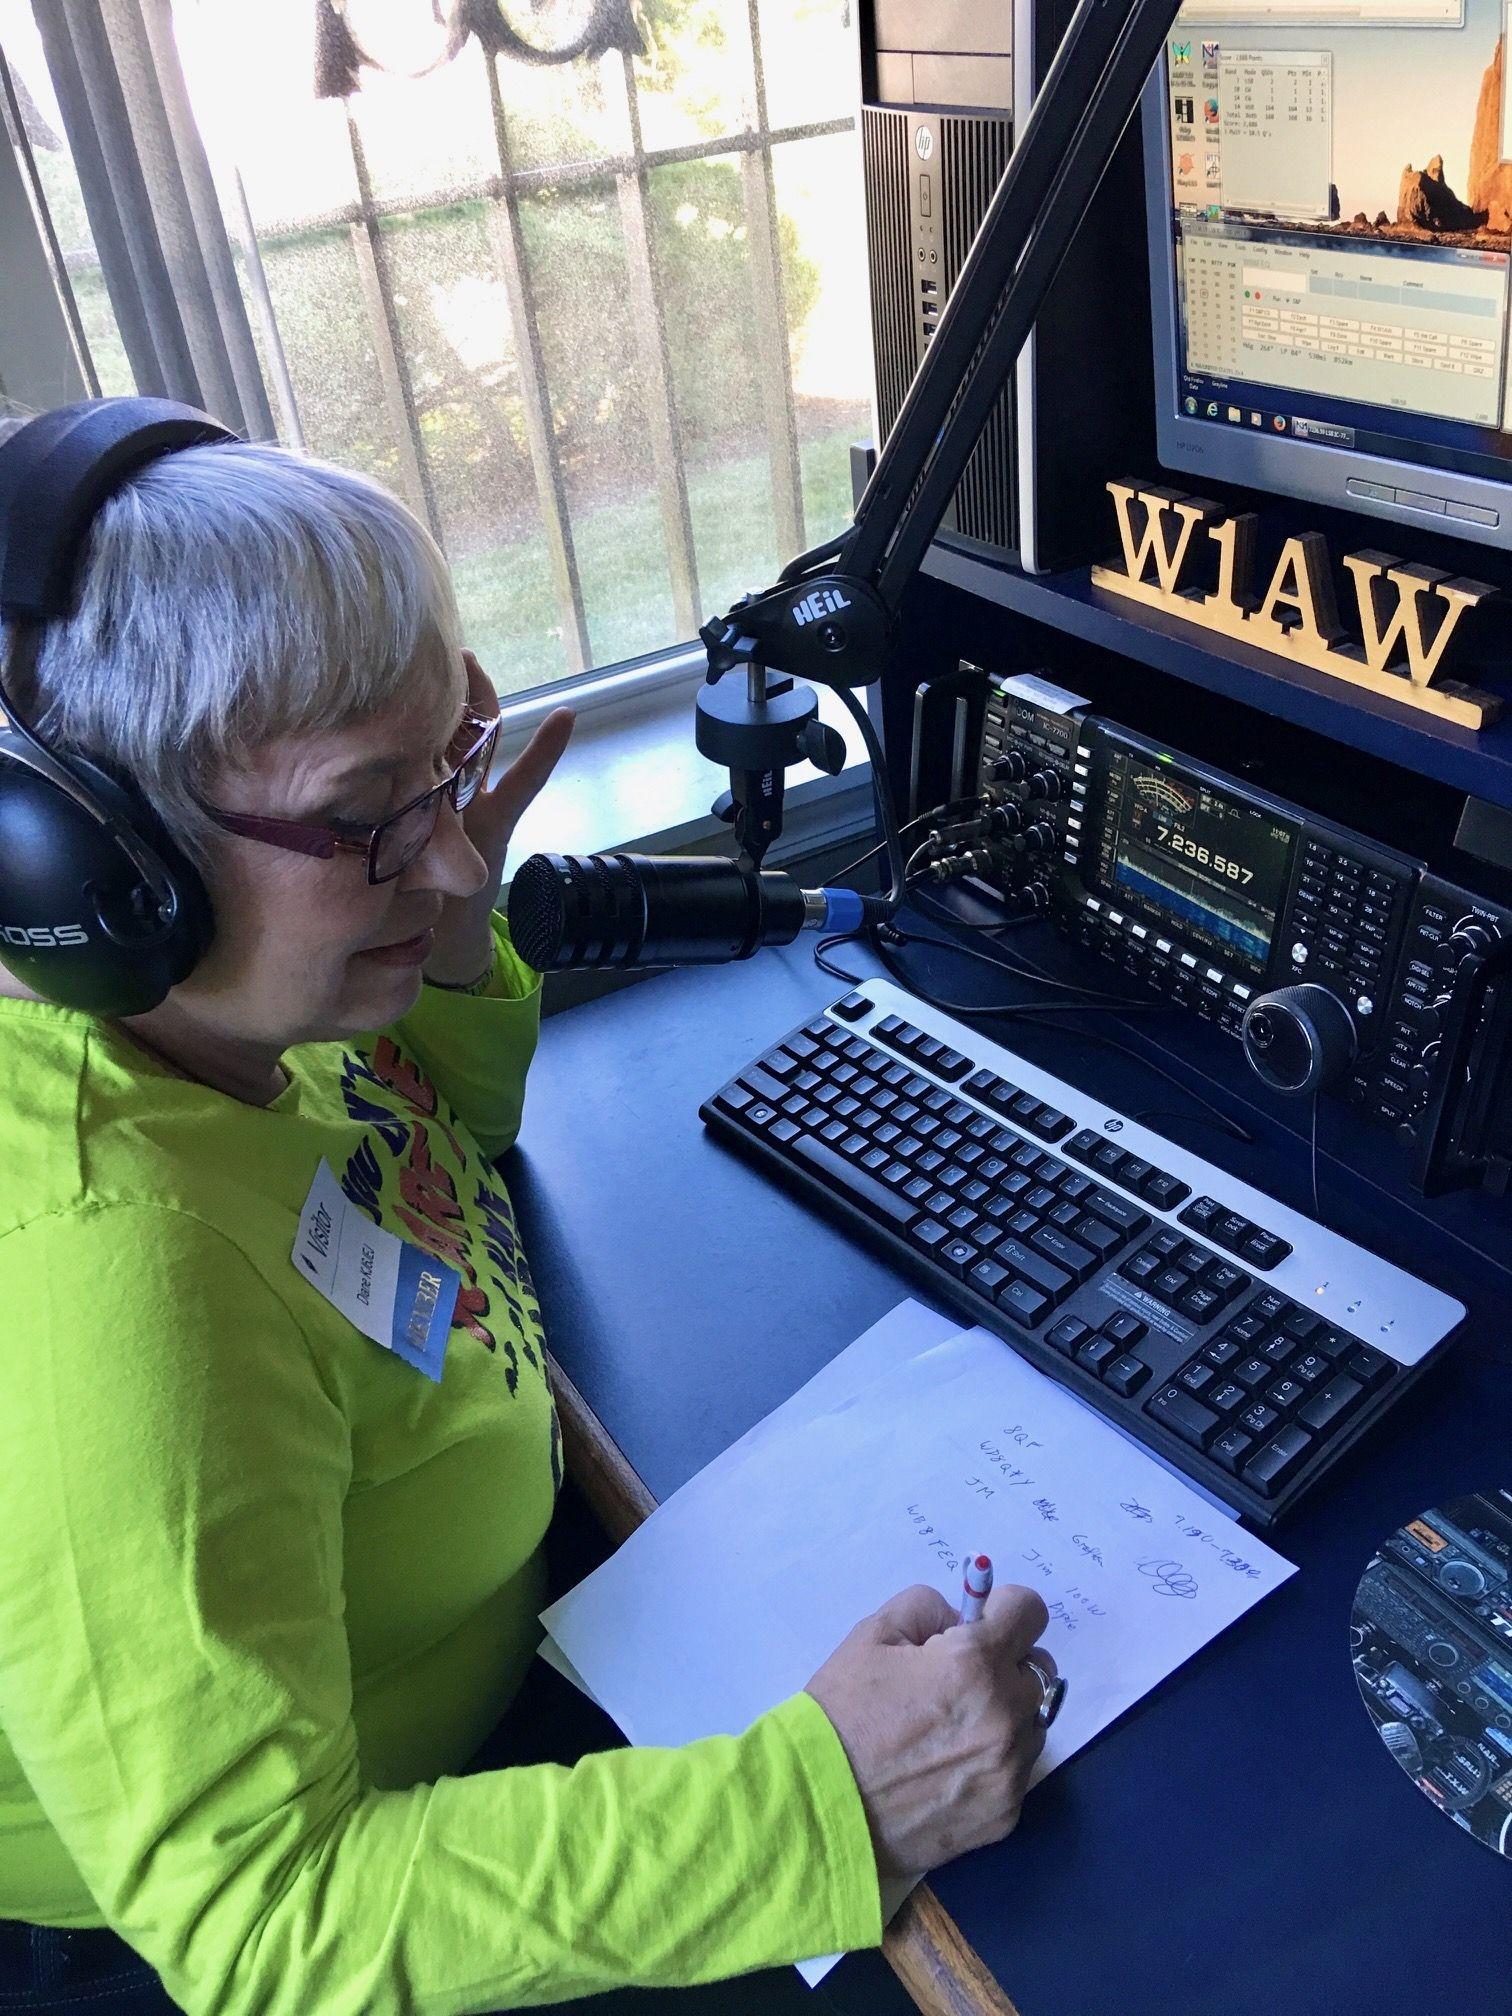 The Ham Cam – Conejo Valley Amateur Radio Club